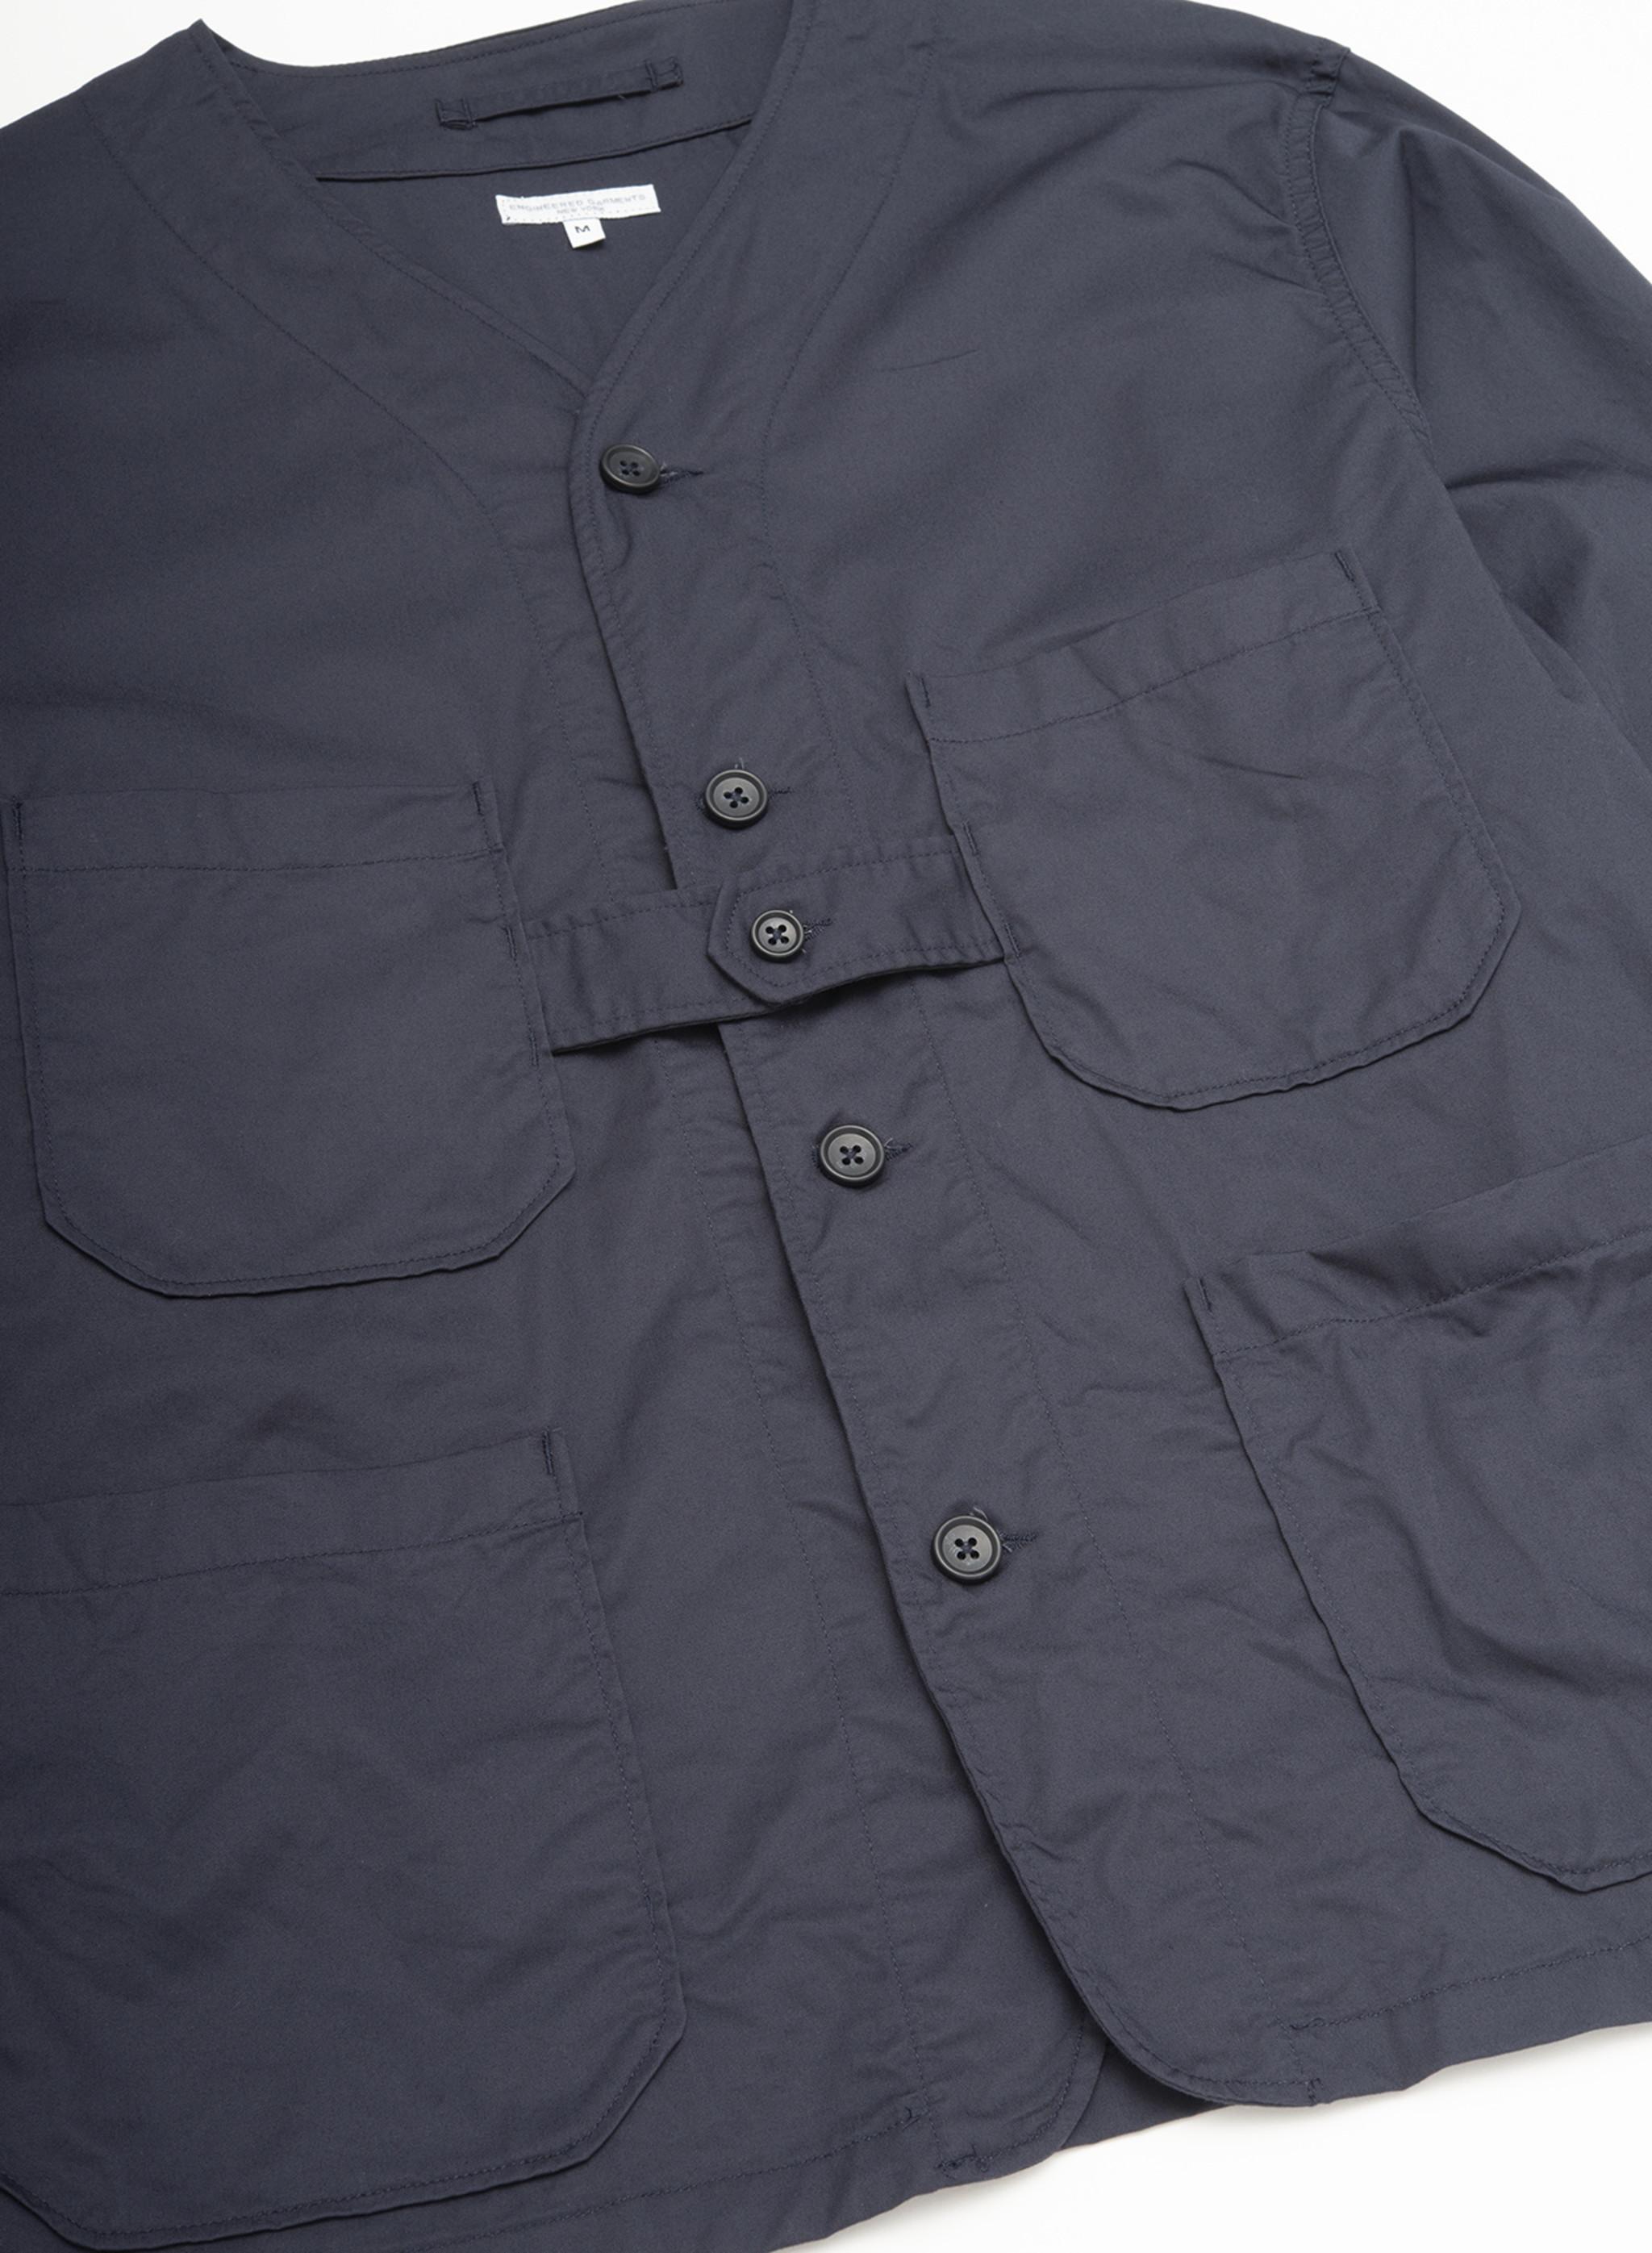 Engineered Garments Cardigan Jacket - Dk.Navy High Count Twill